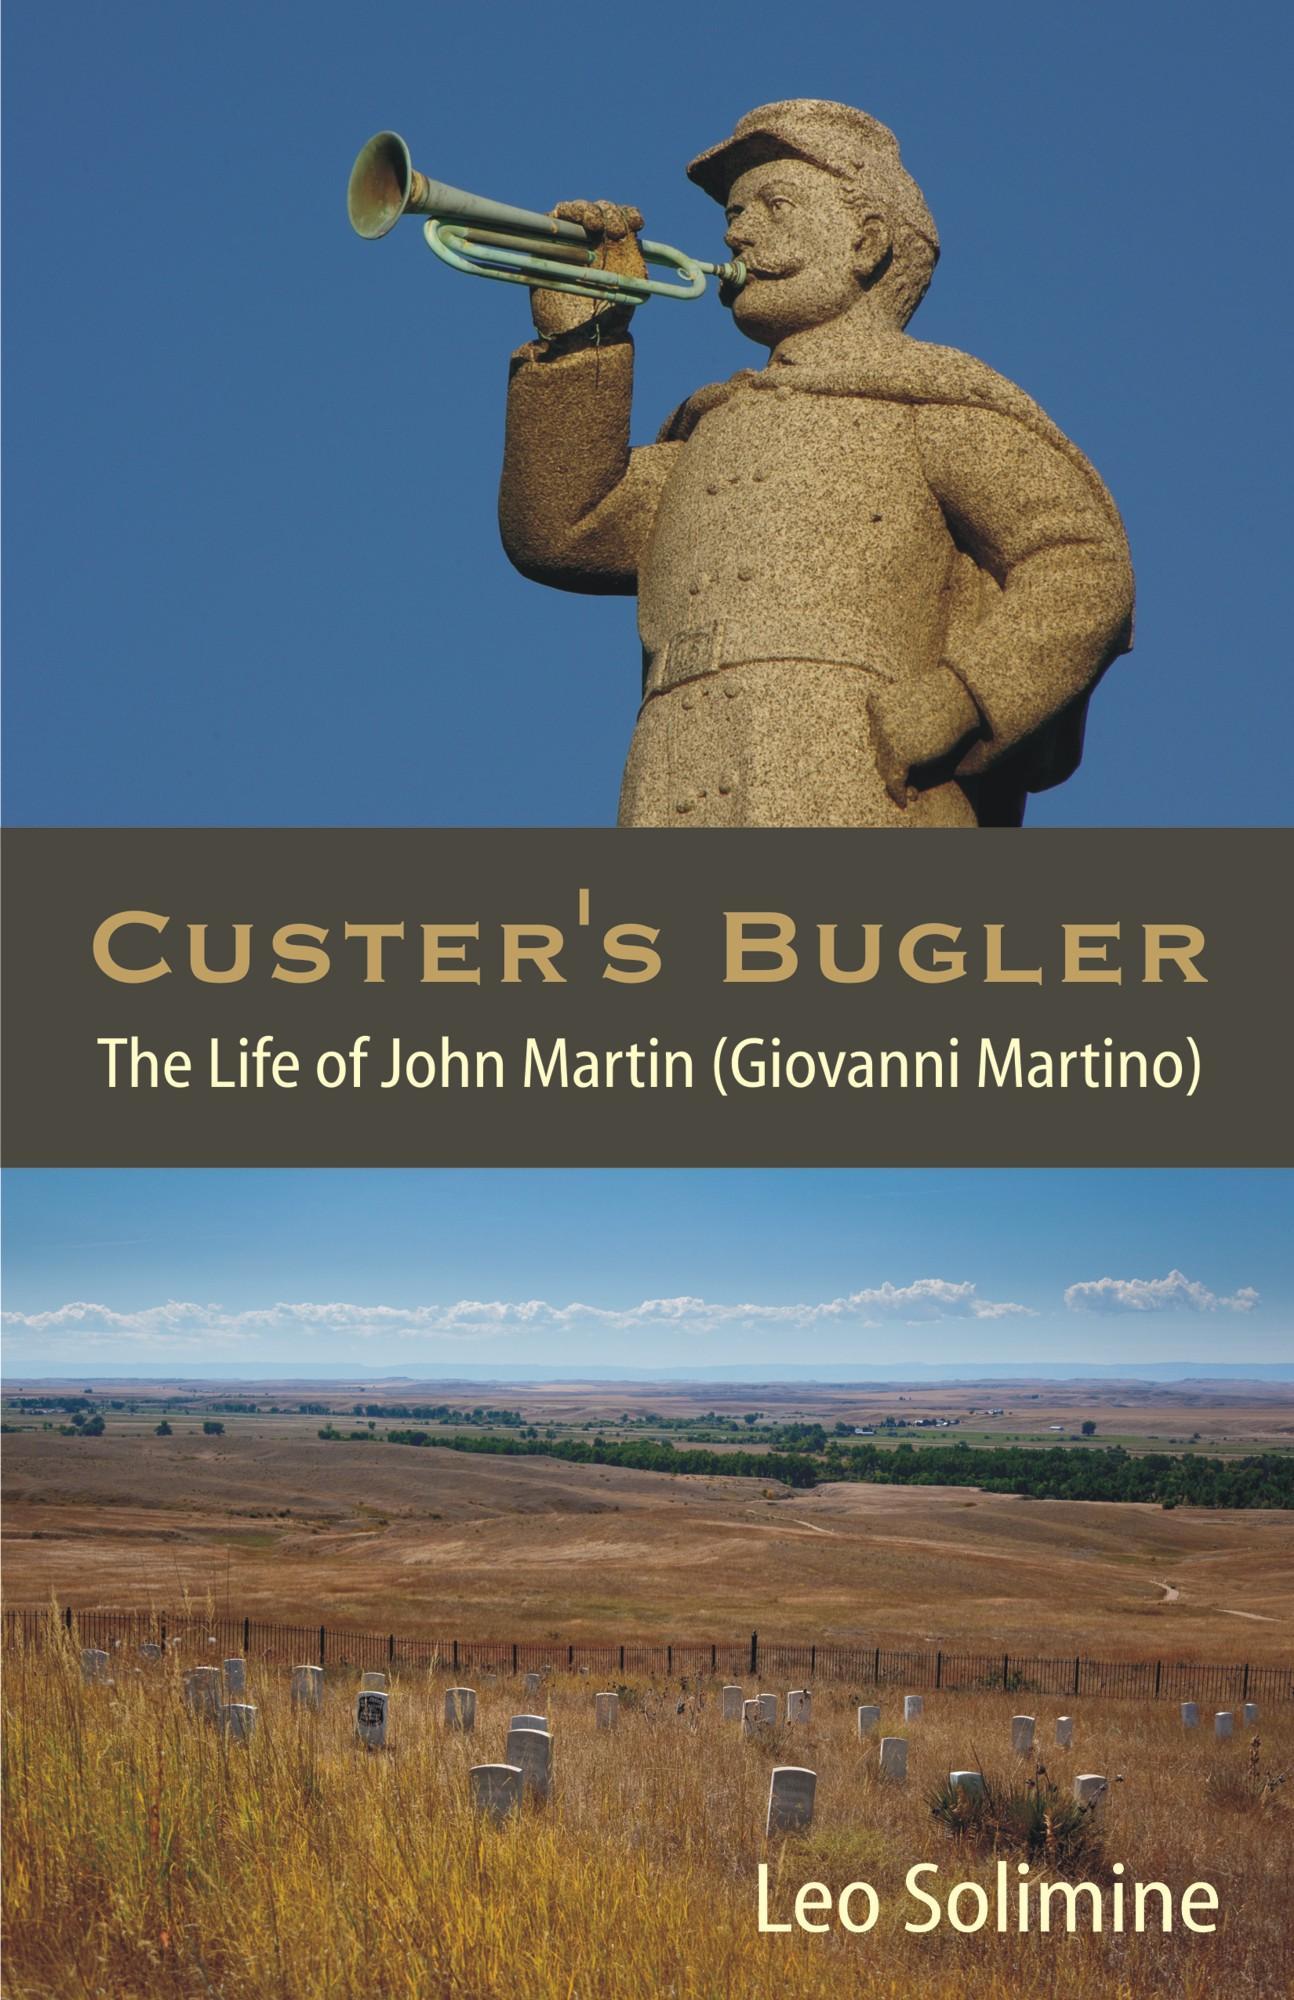 Custer's Bugler: The Life of John Martin (Giovanni Martino) EB9781612330853